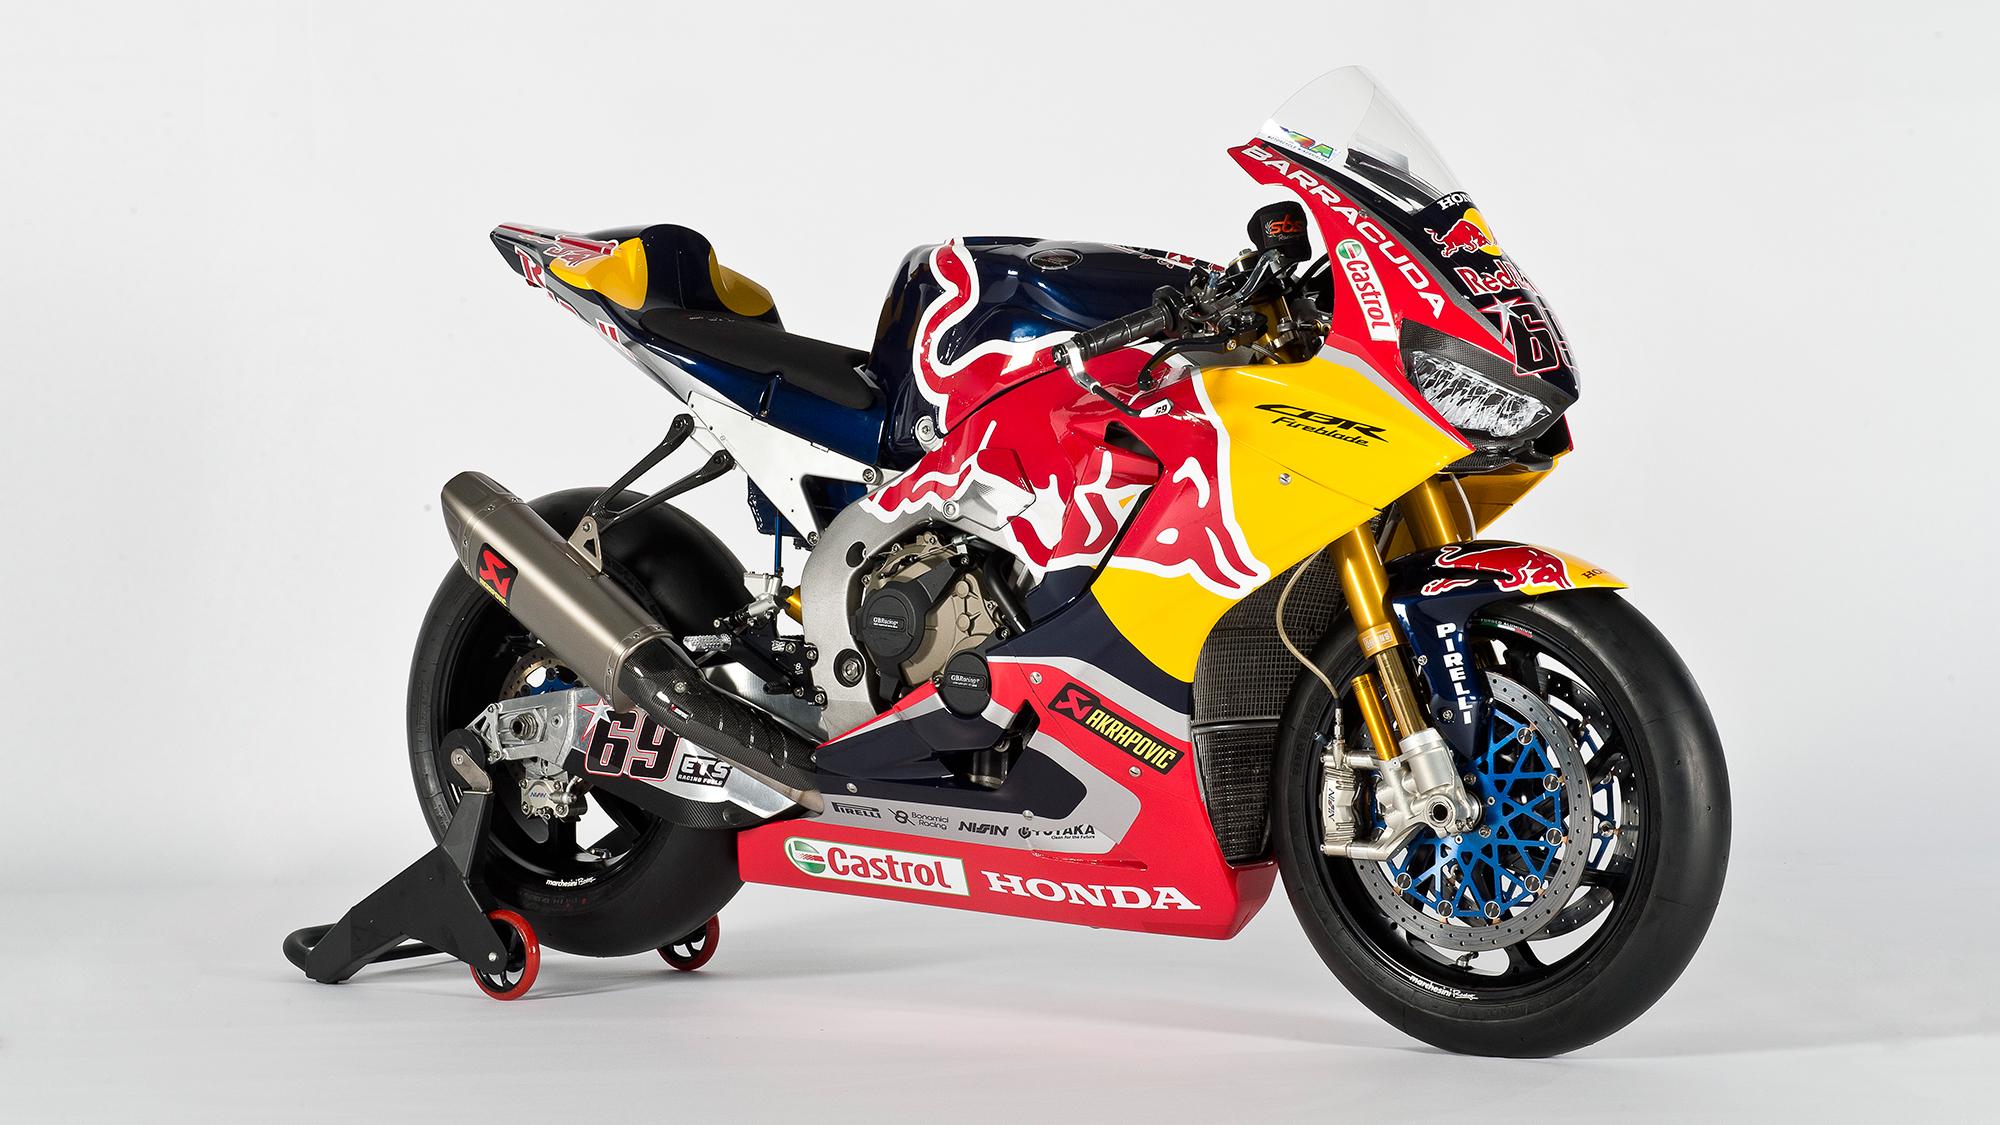 Red-Bull-Honda-cbr1000rr-livery